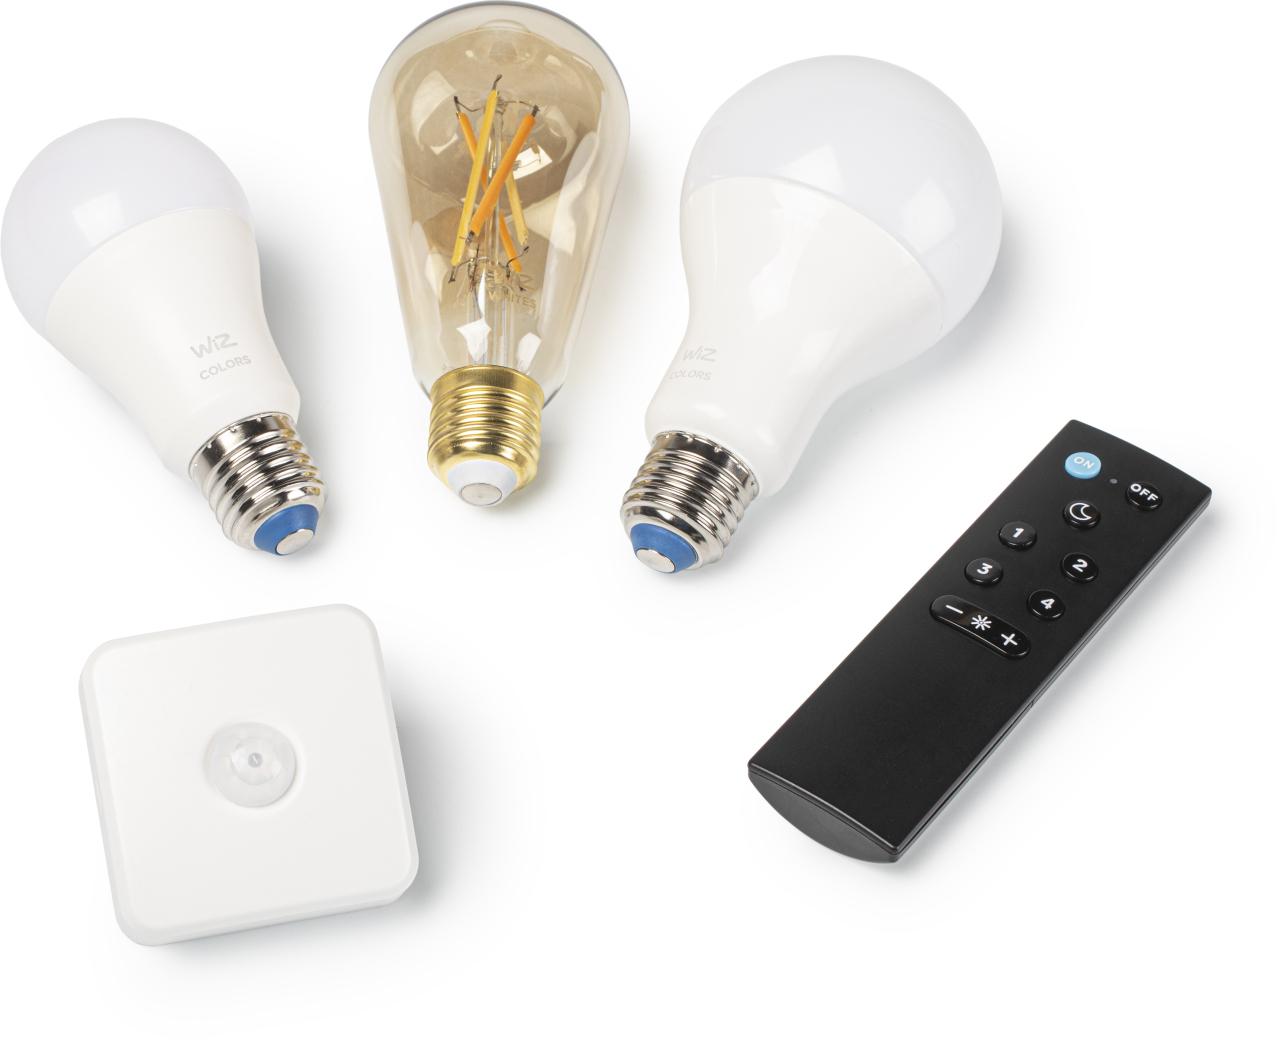 Philips Hue alternatief Wiz slimme verlichting review lamp afstandsbediening bewegingsmelder